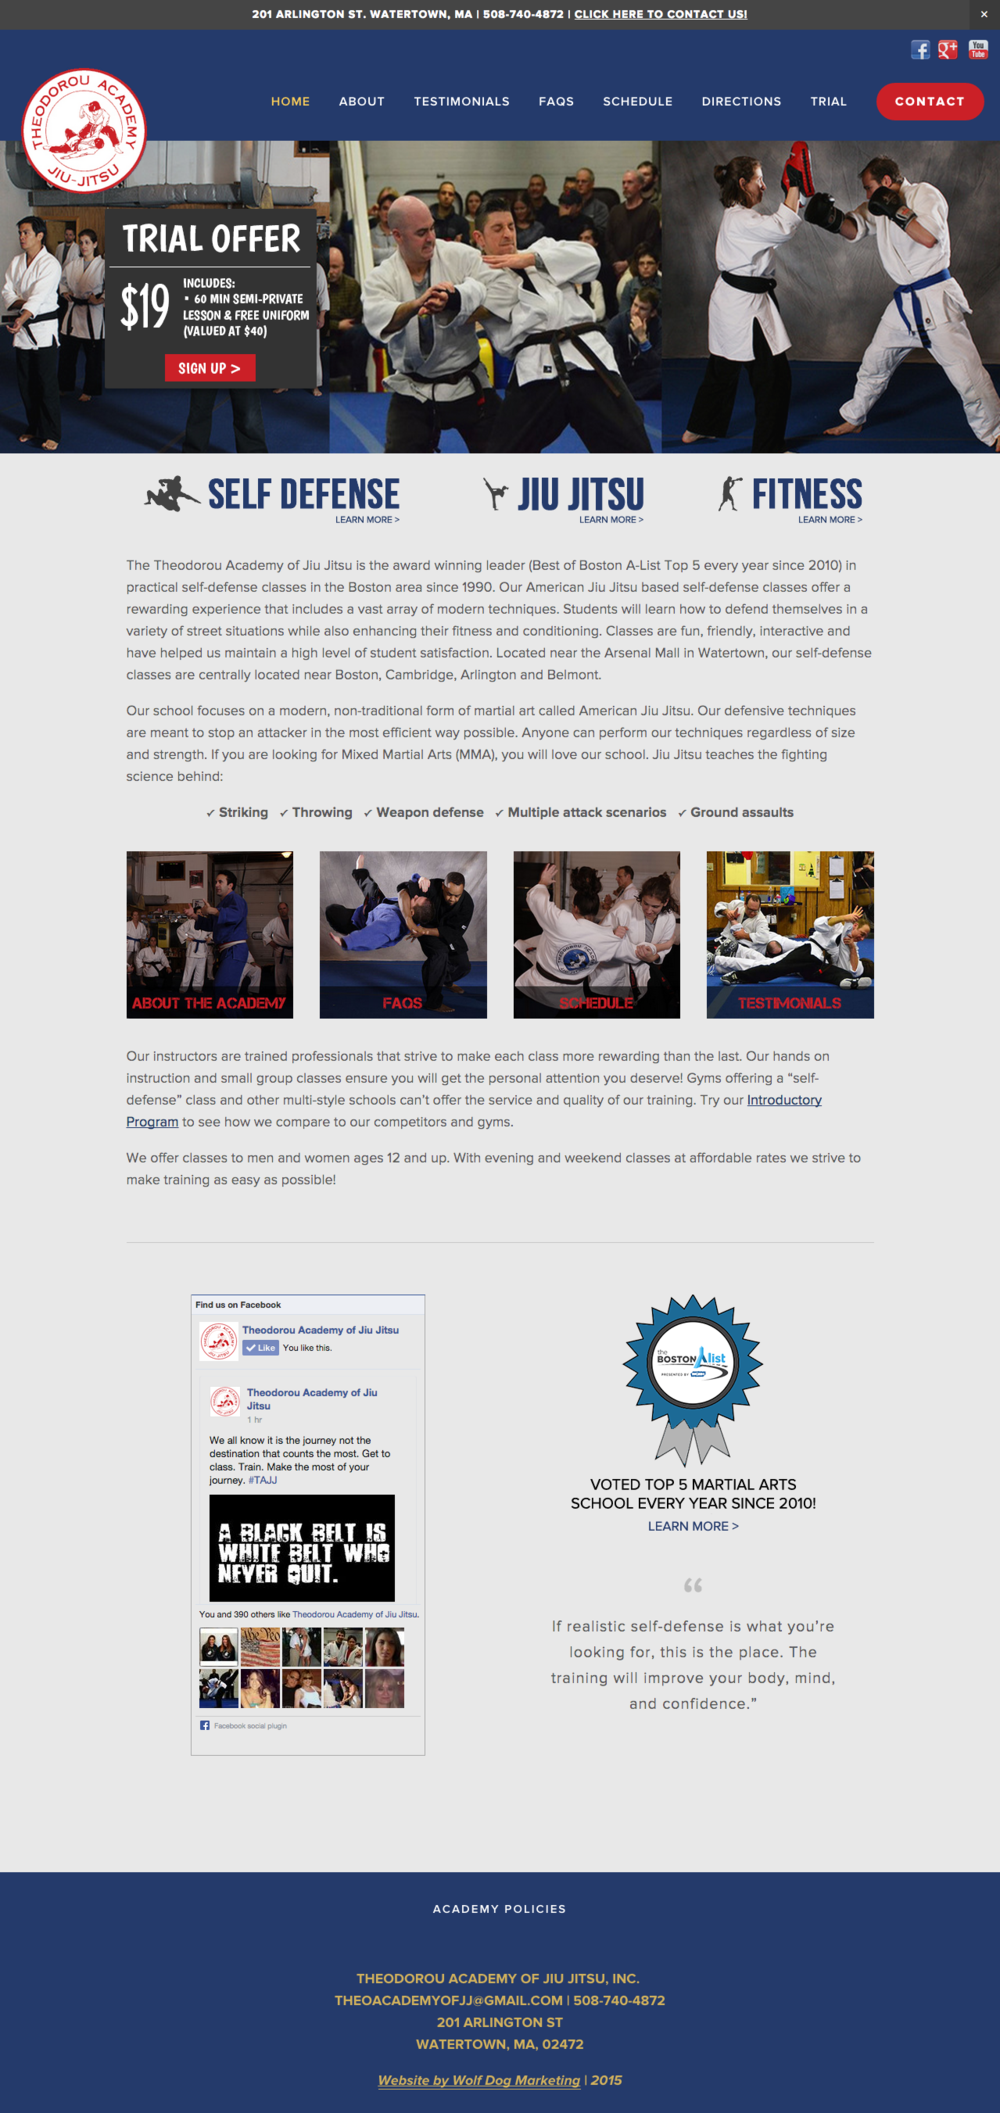 Theodorou Academy of Jiu Jitsu_hp.png